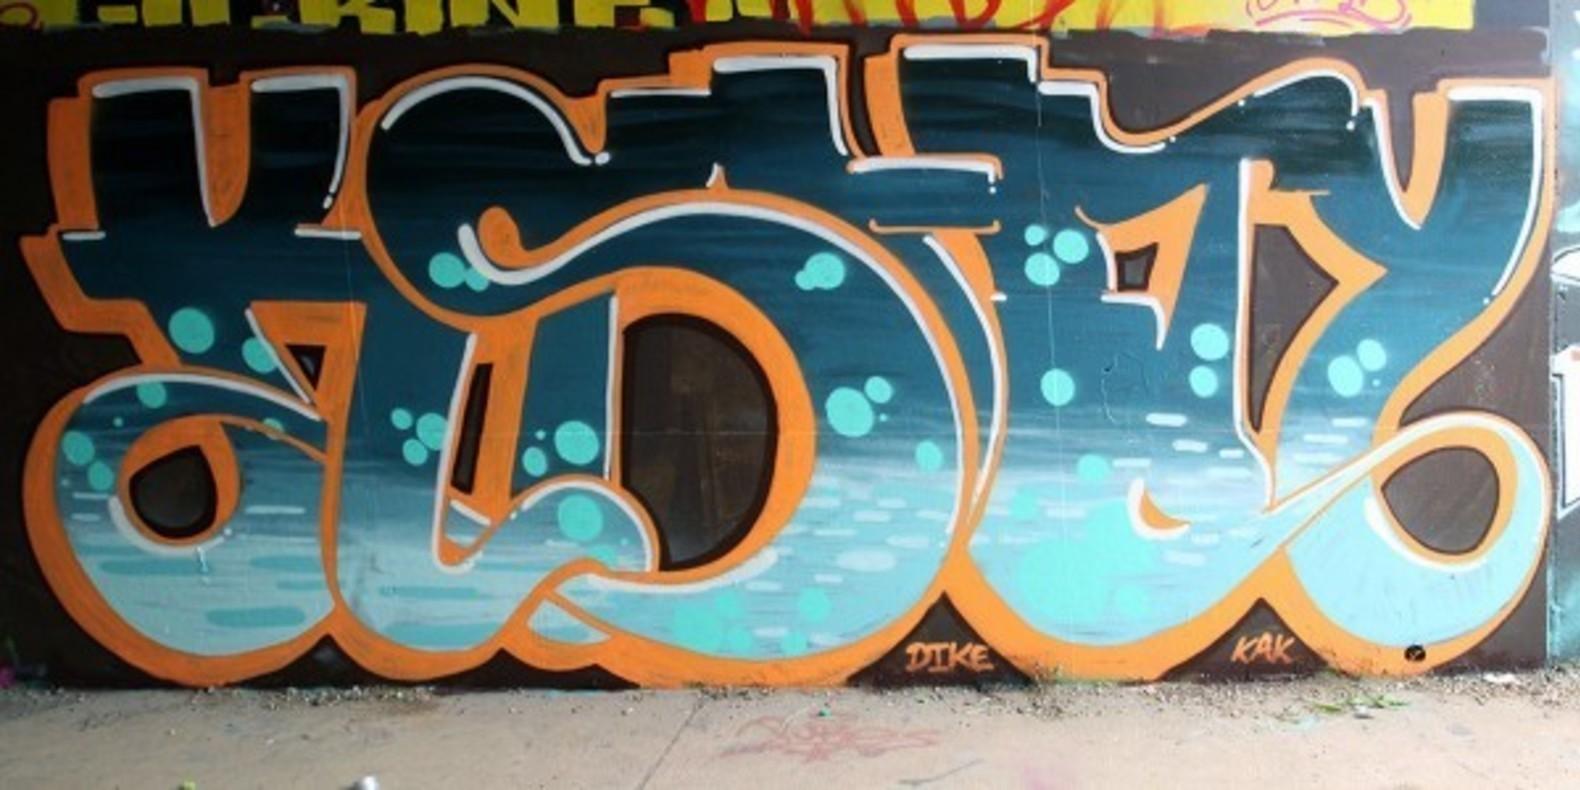 13-KUSHTY-Original-Graffiti graffitis imprimés en 3D Noramlly Ben